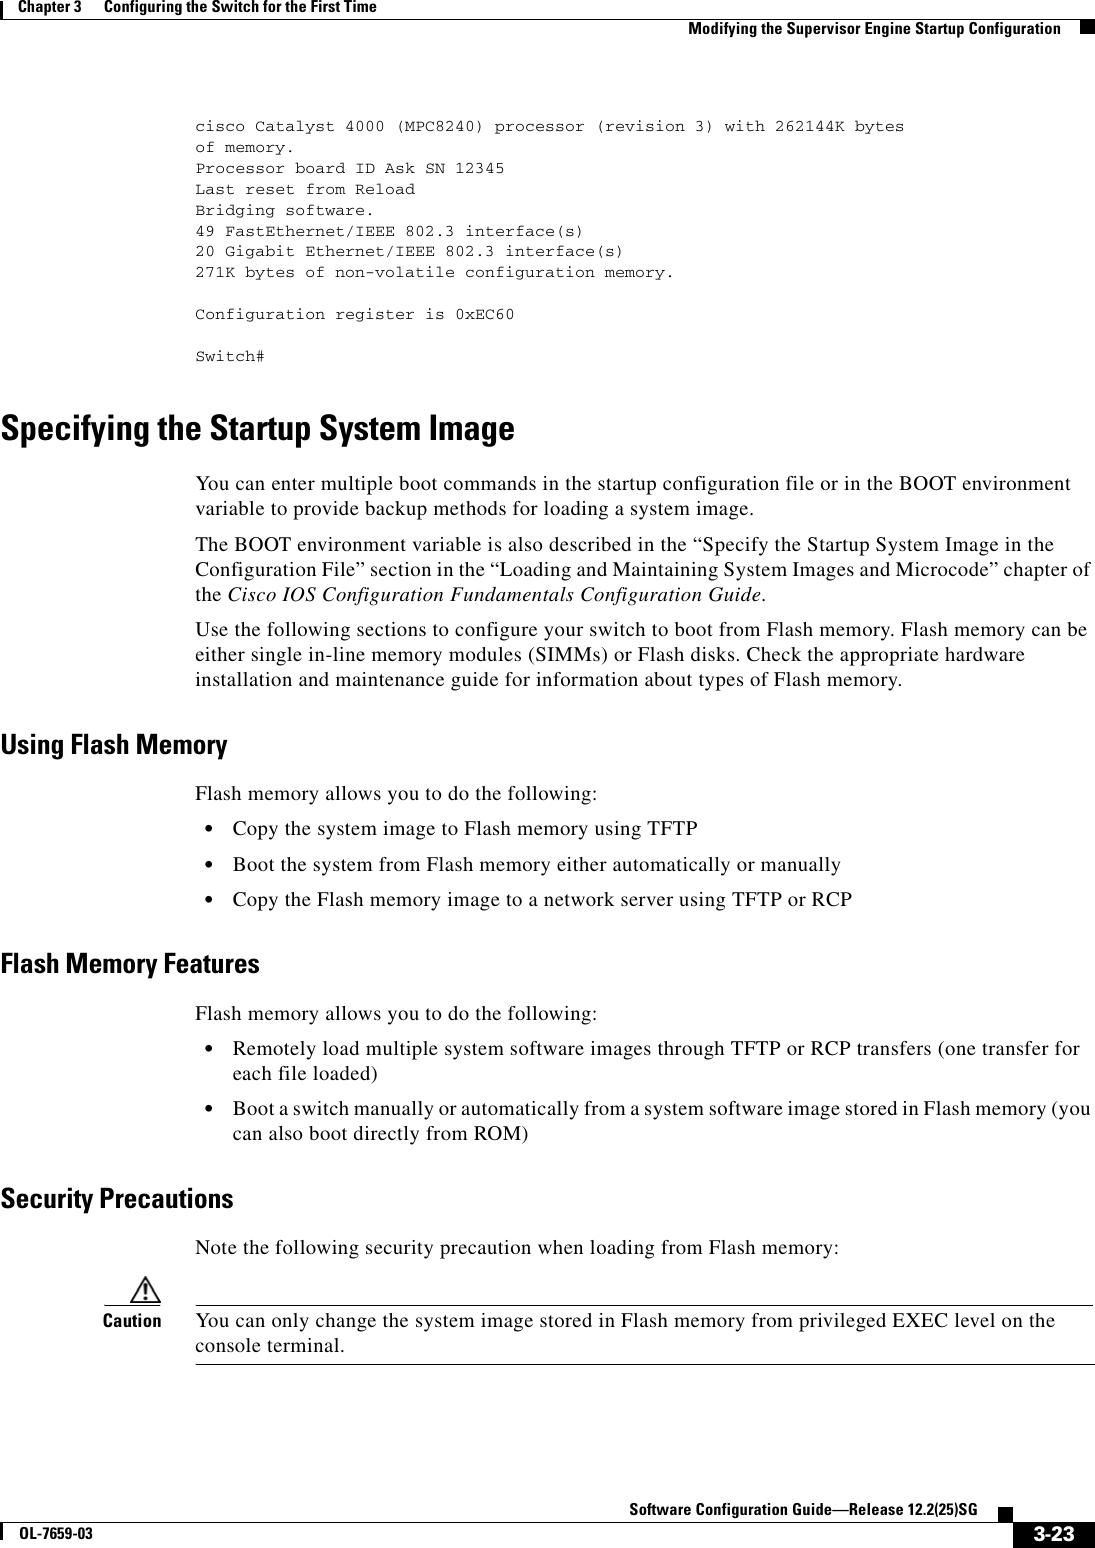 Cisco Boot System Flash